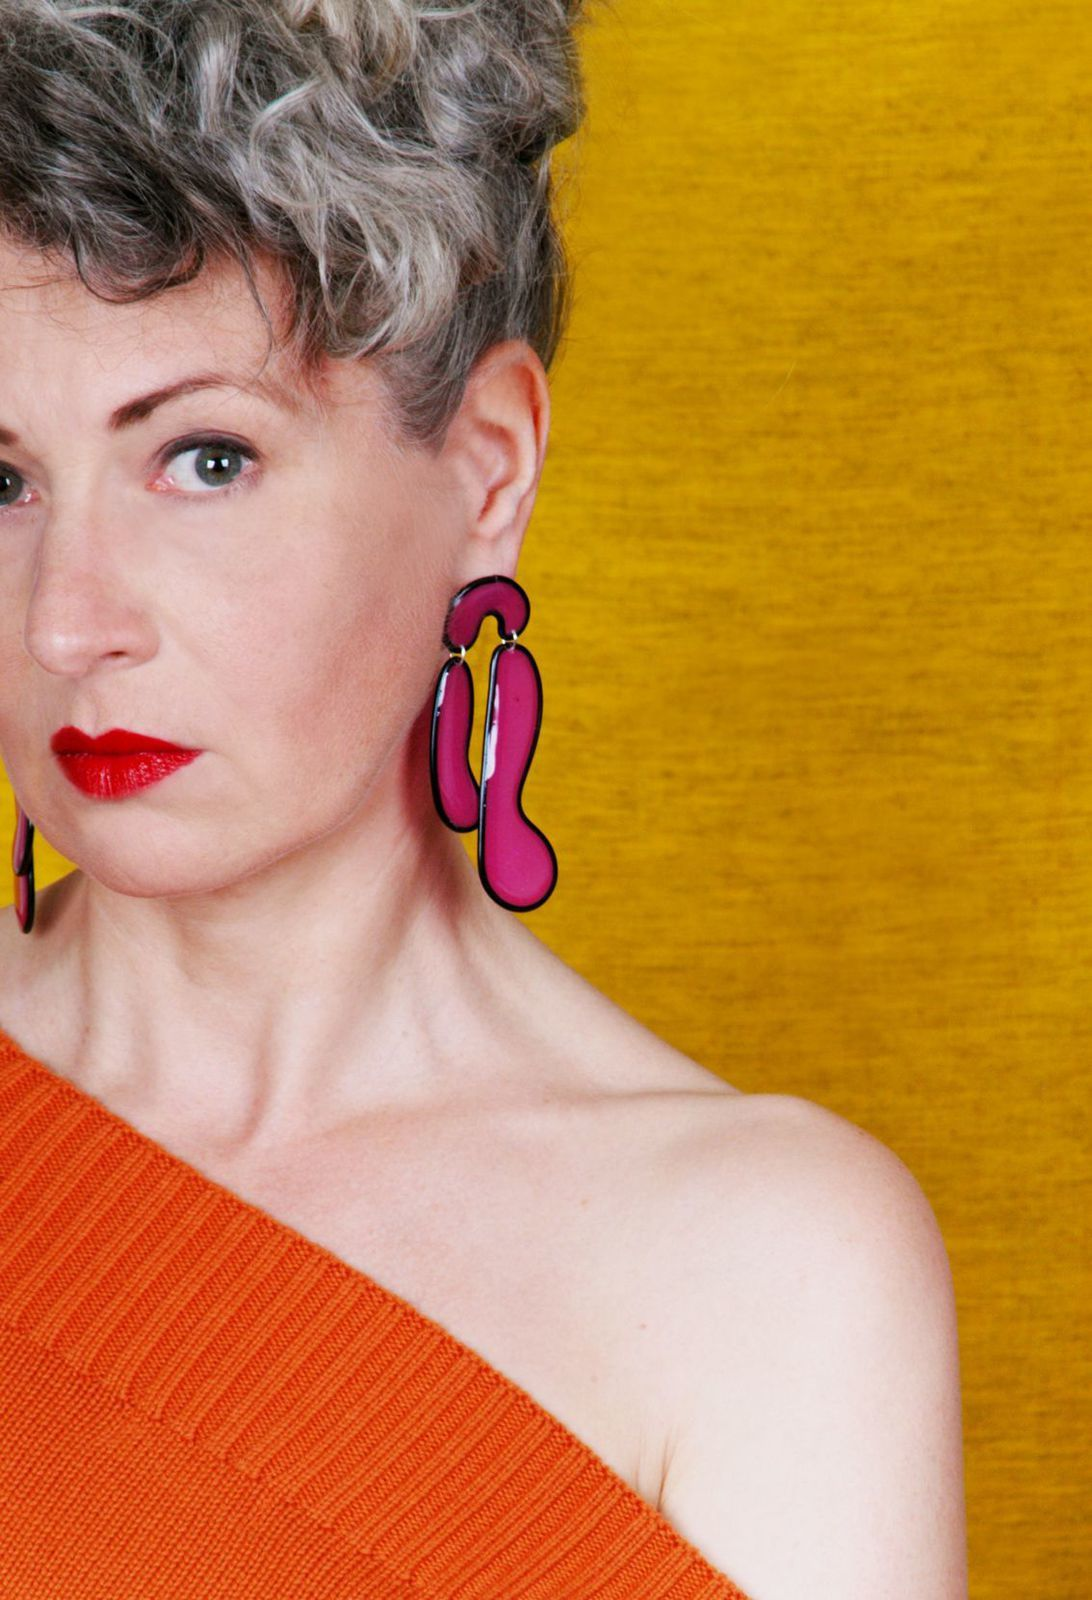 Lila Statement Ohrringe aus Kunstharz